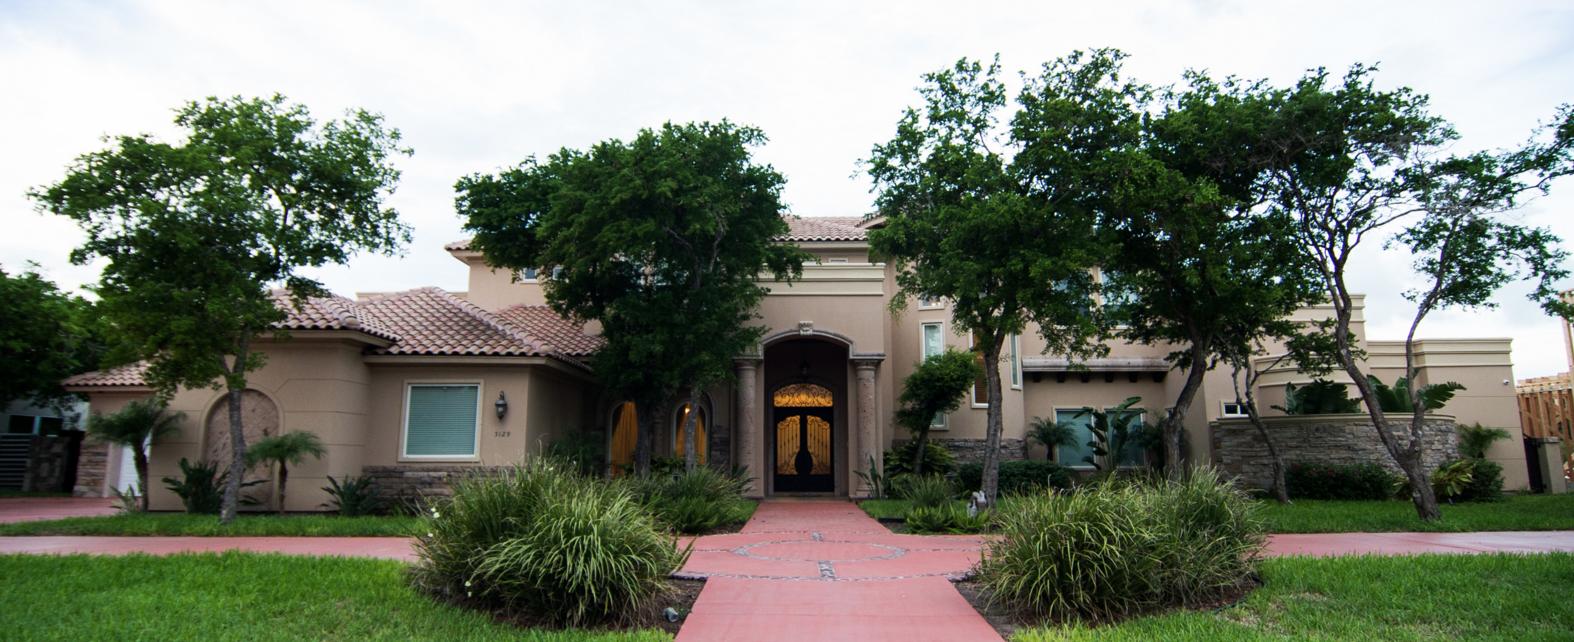 JORFLO HOUSE | BROWNSVILLE, TX